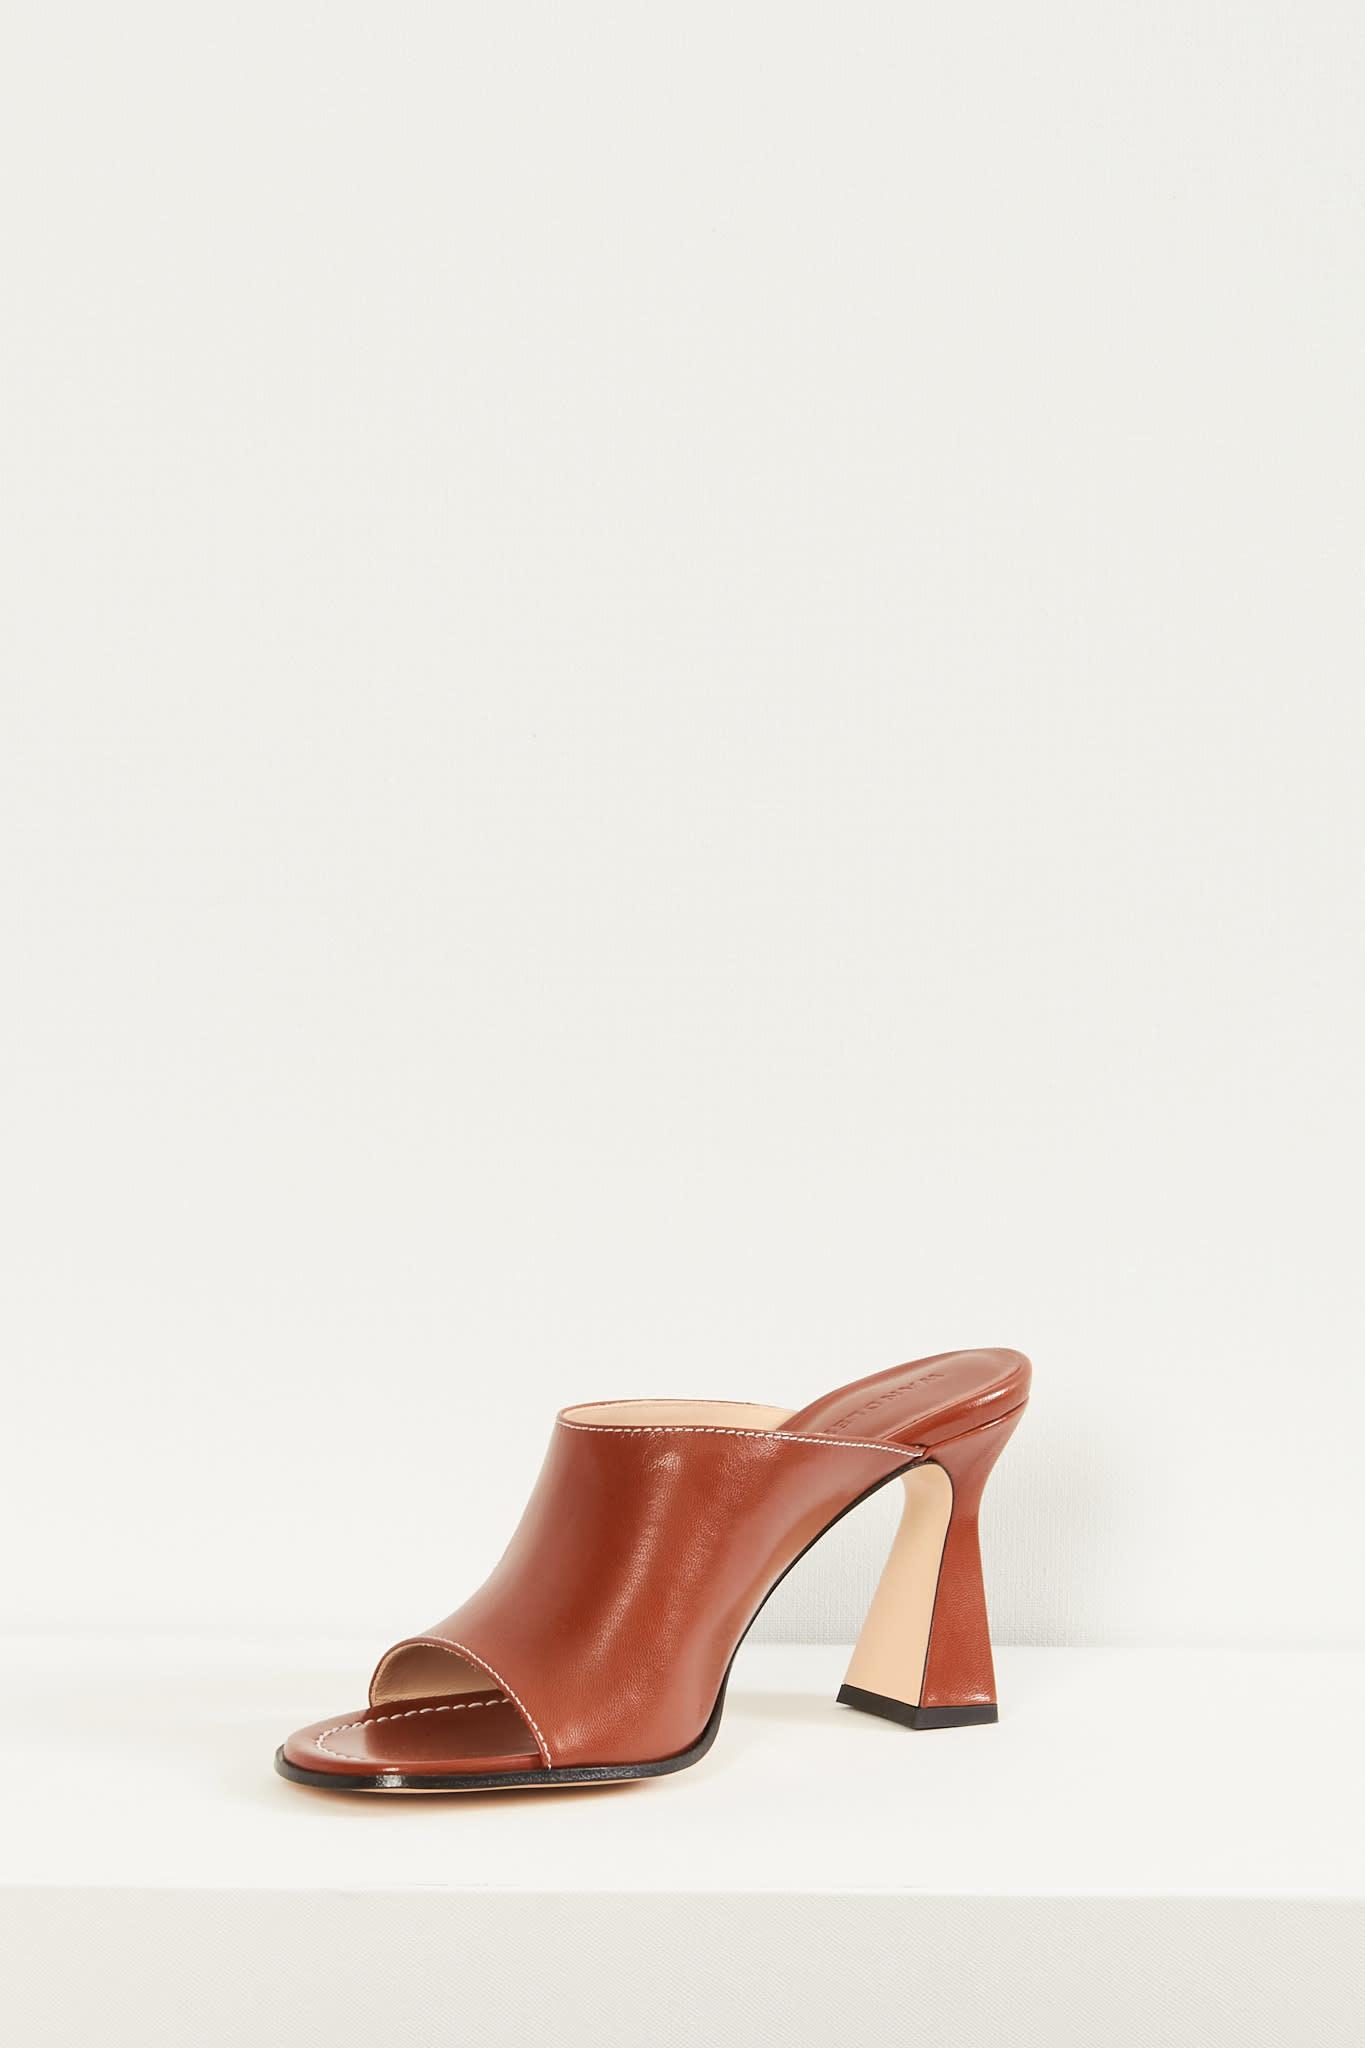 Wandler - Marie sandal lambskin leather